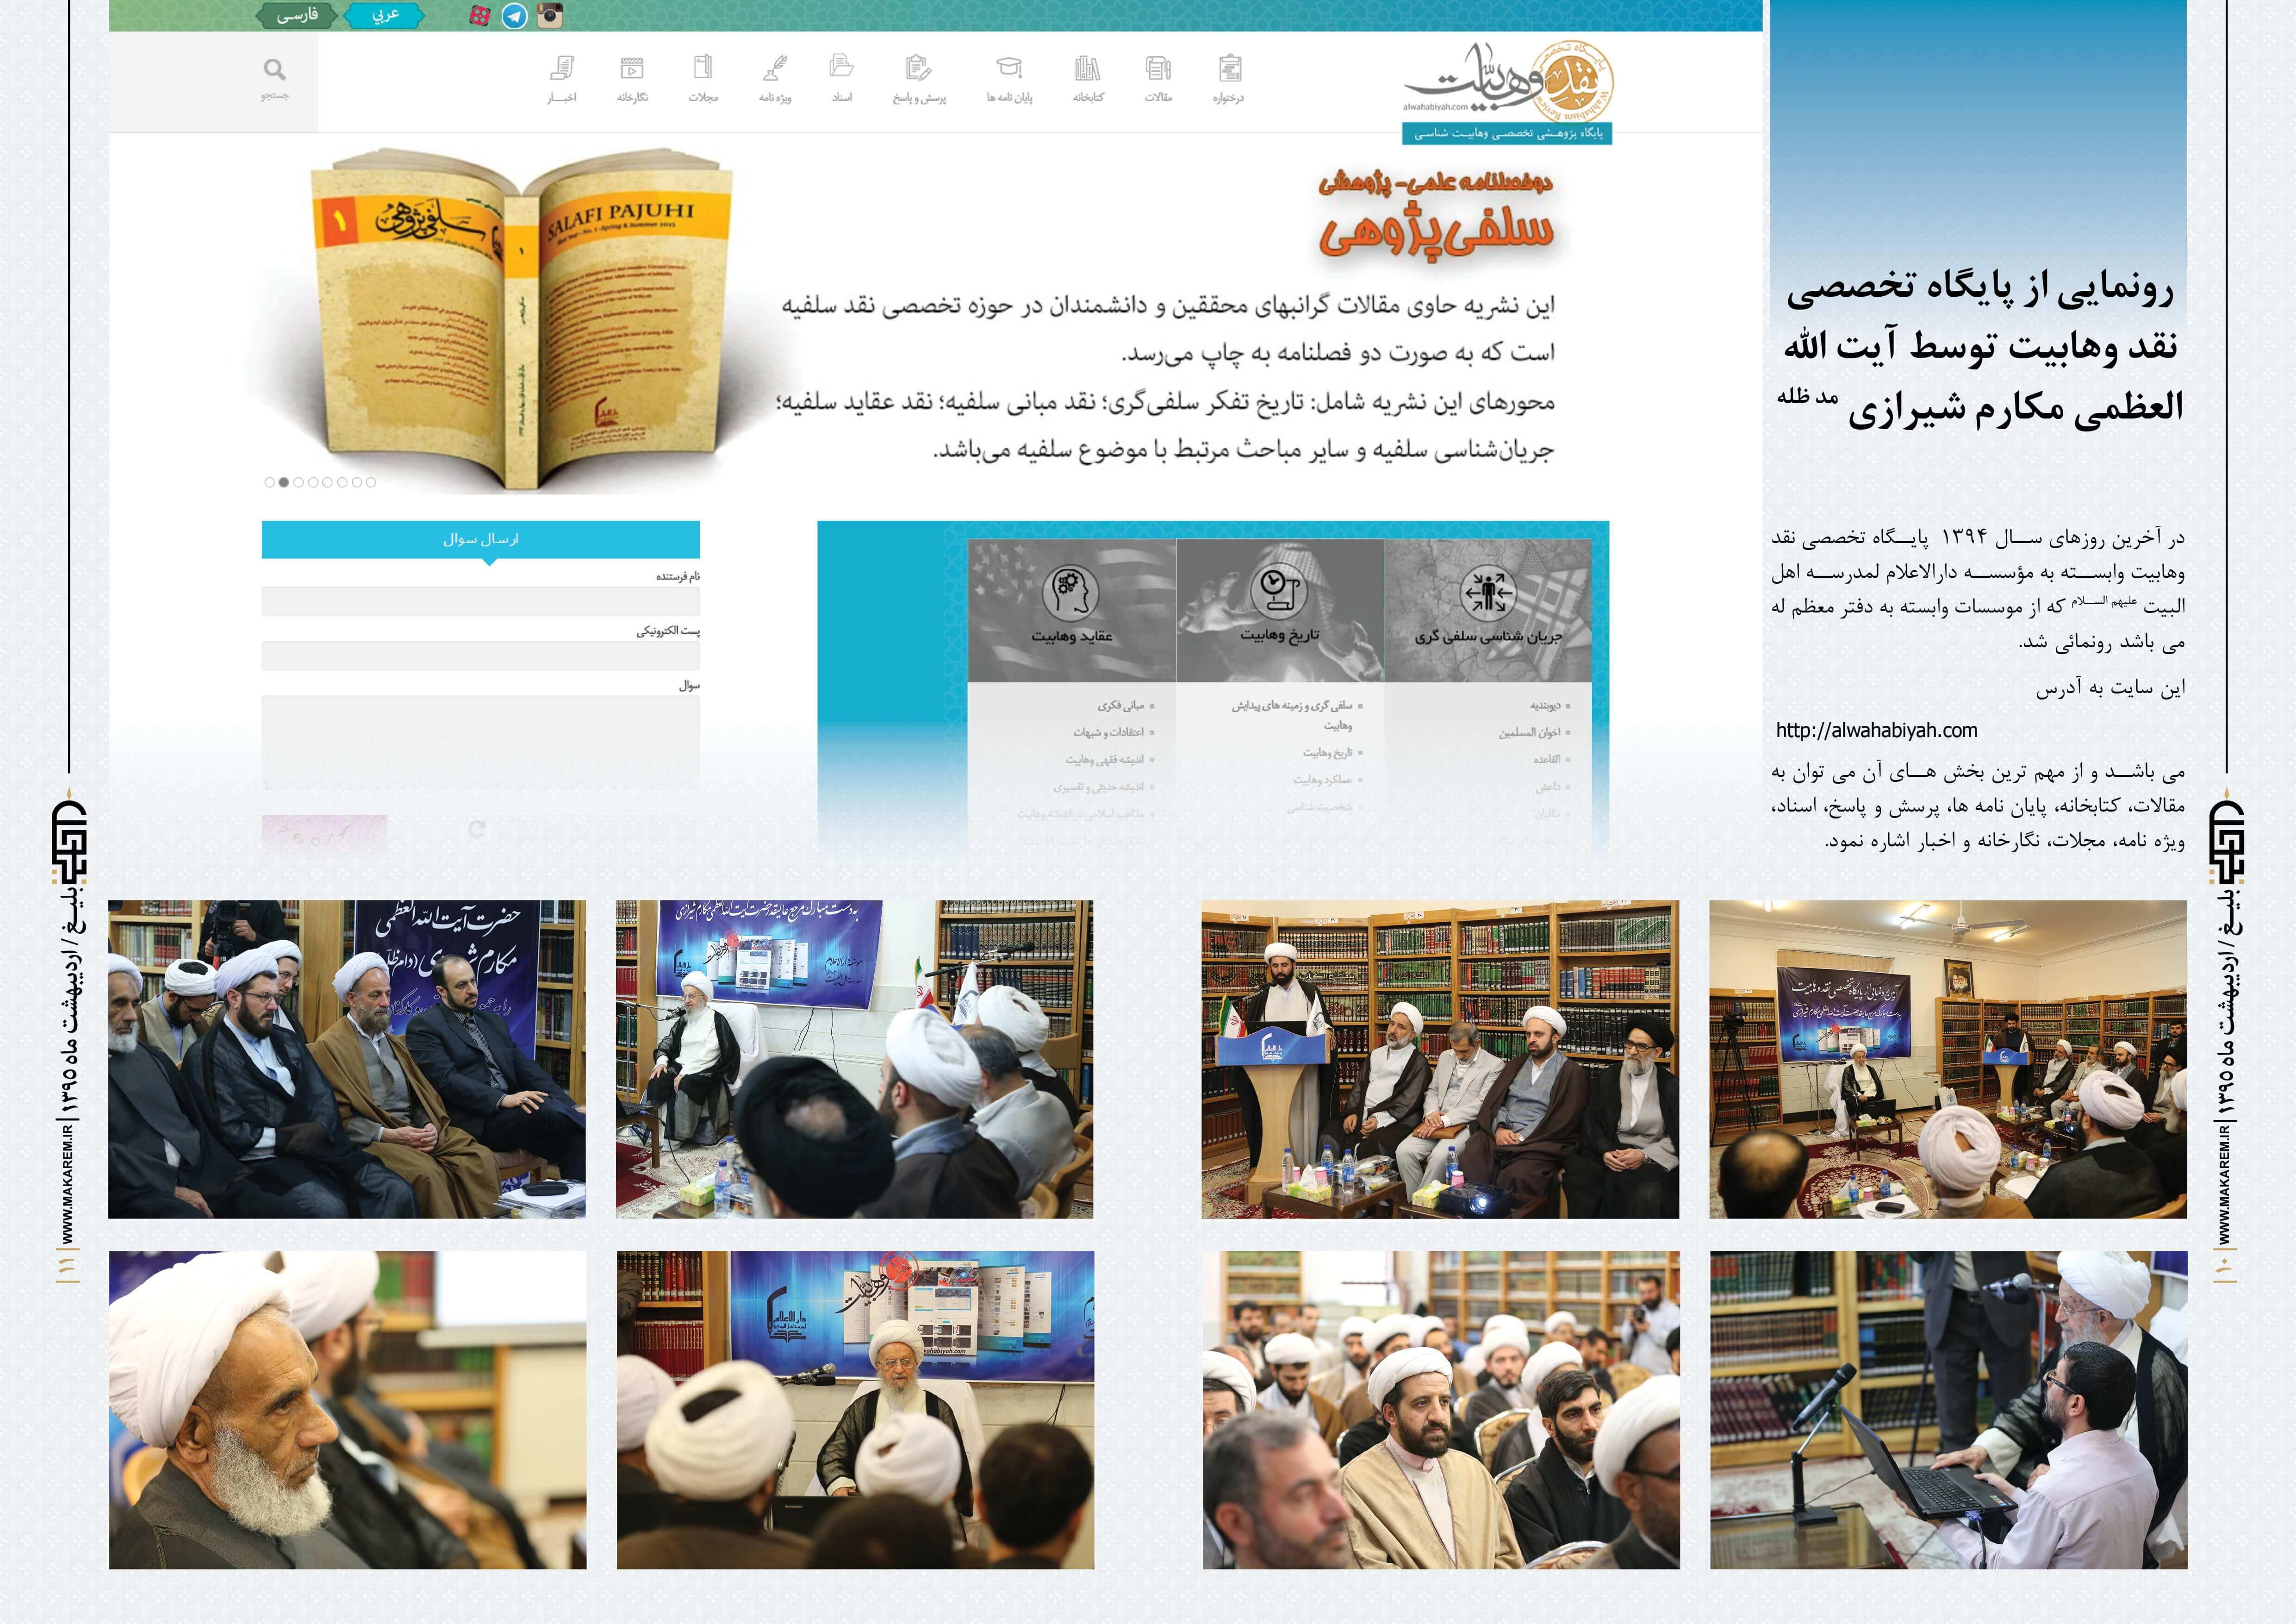 06-مدرسه الامام امیر المومنین (ع)